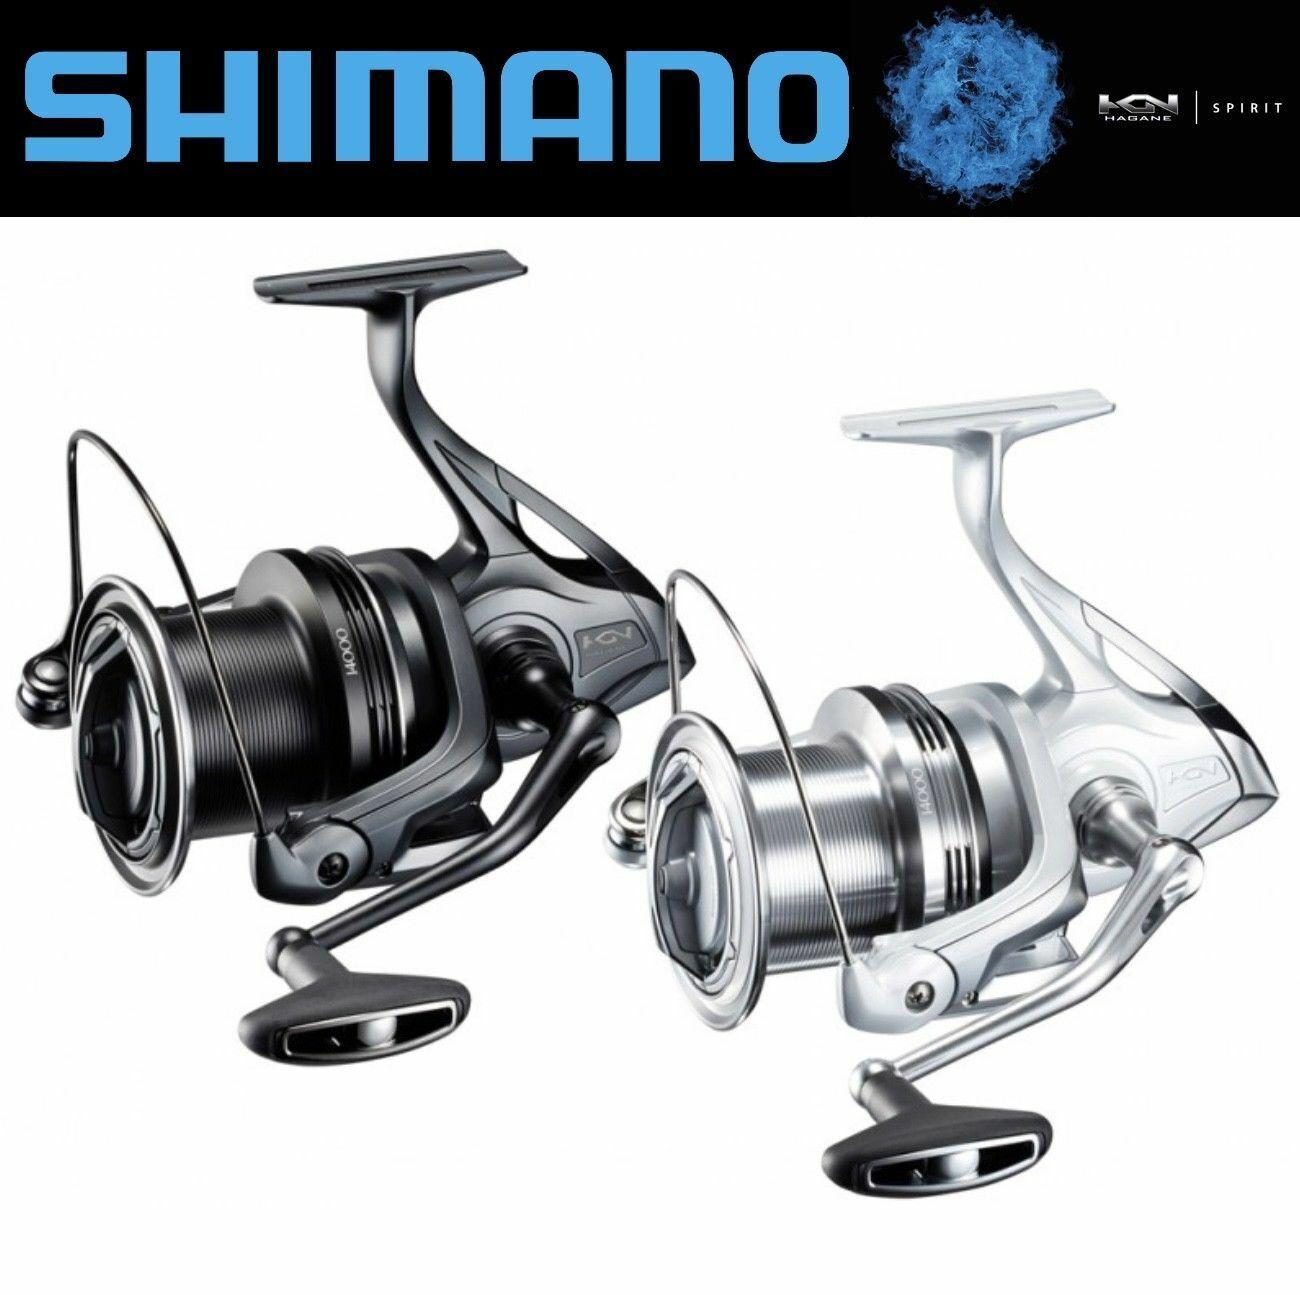 Carrete Shimano Surf Big Pit Aero Technium Mgs 14000 XTC xsc